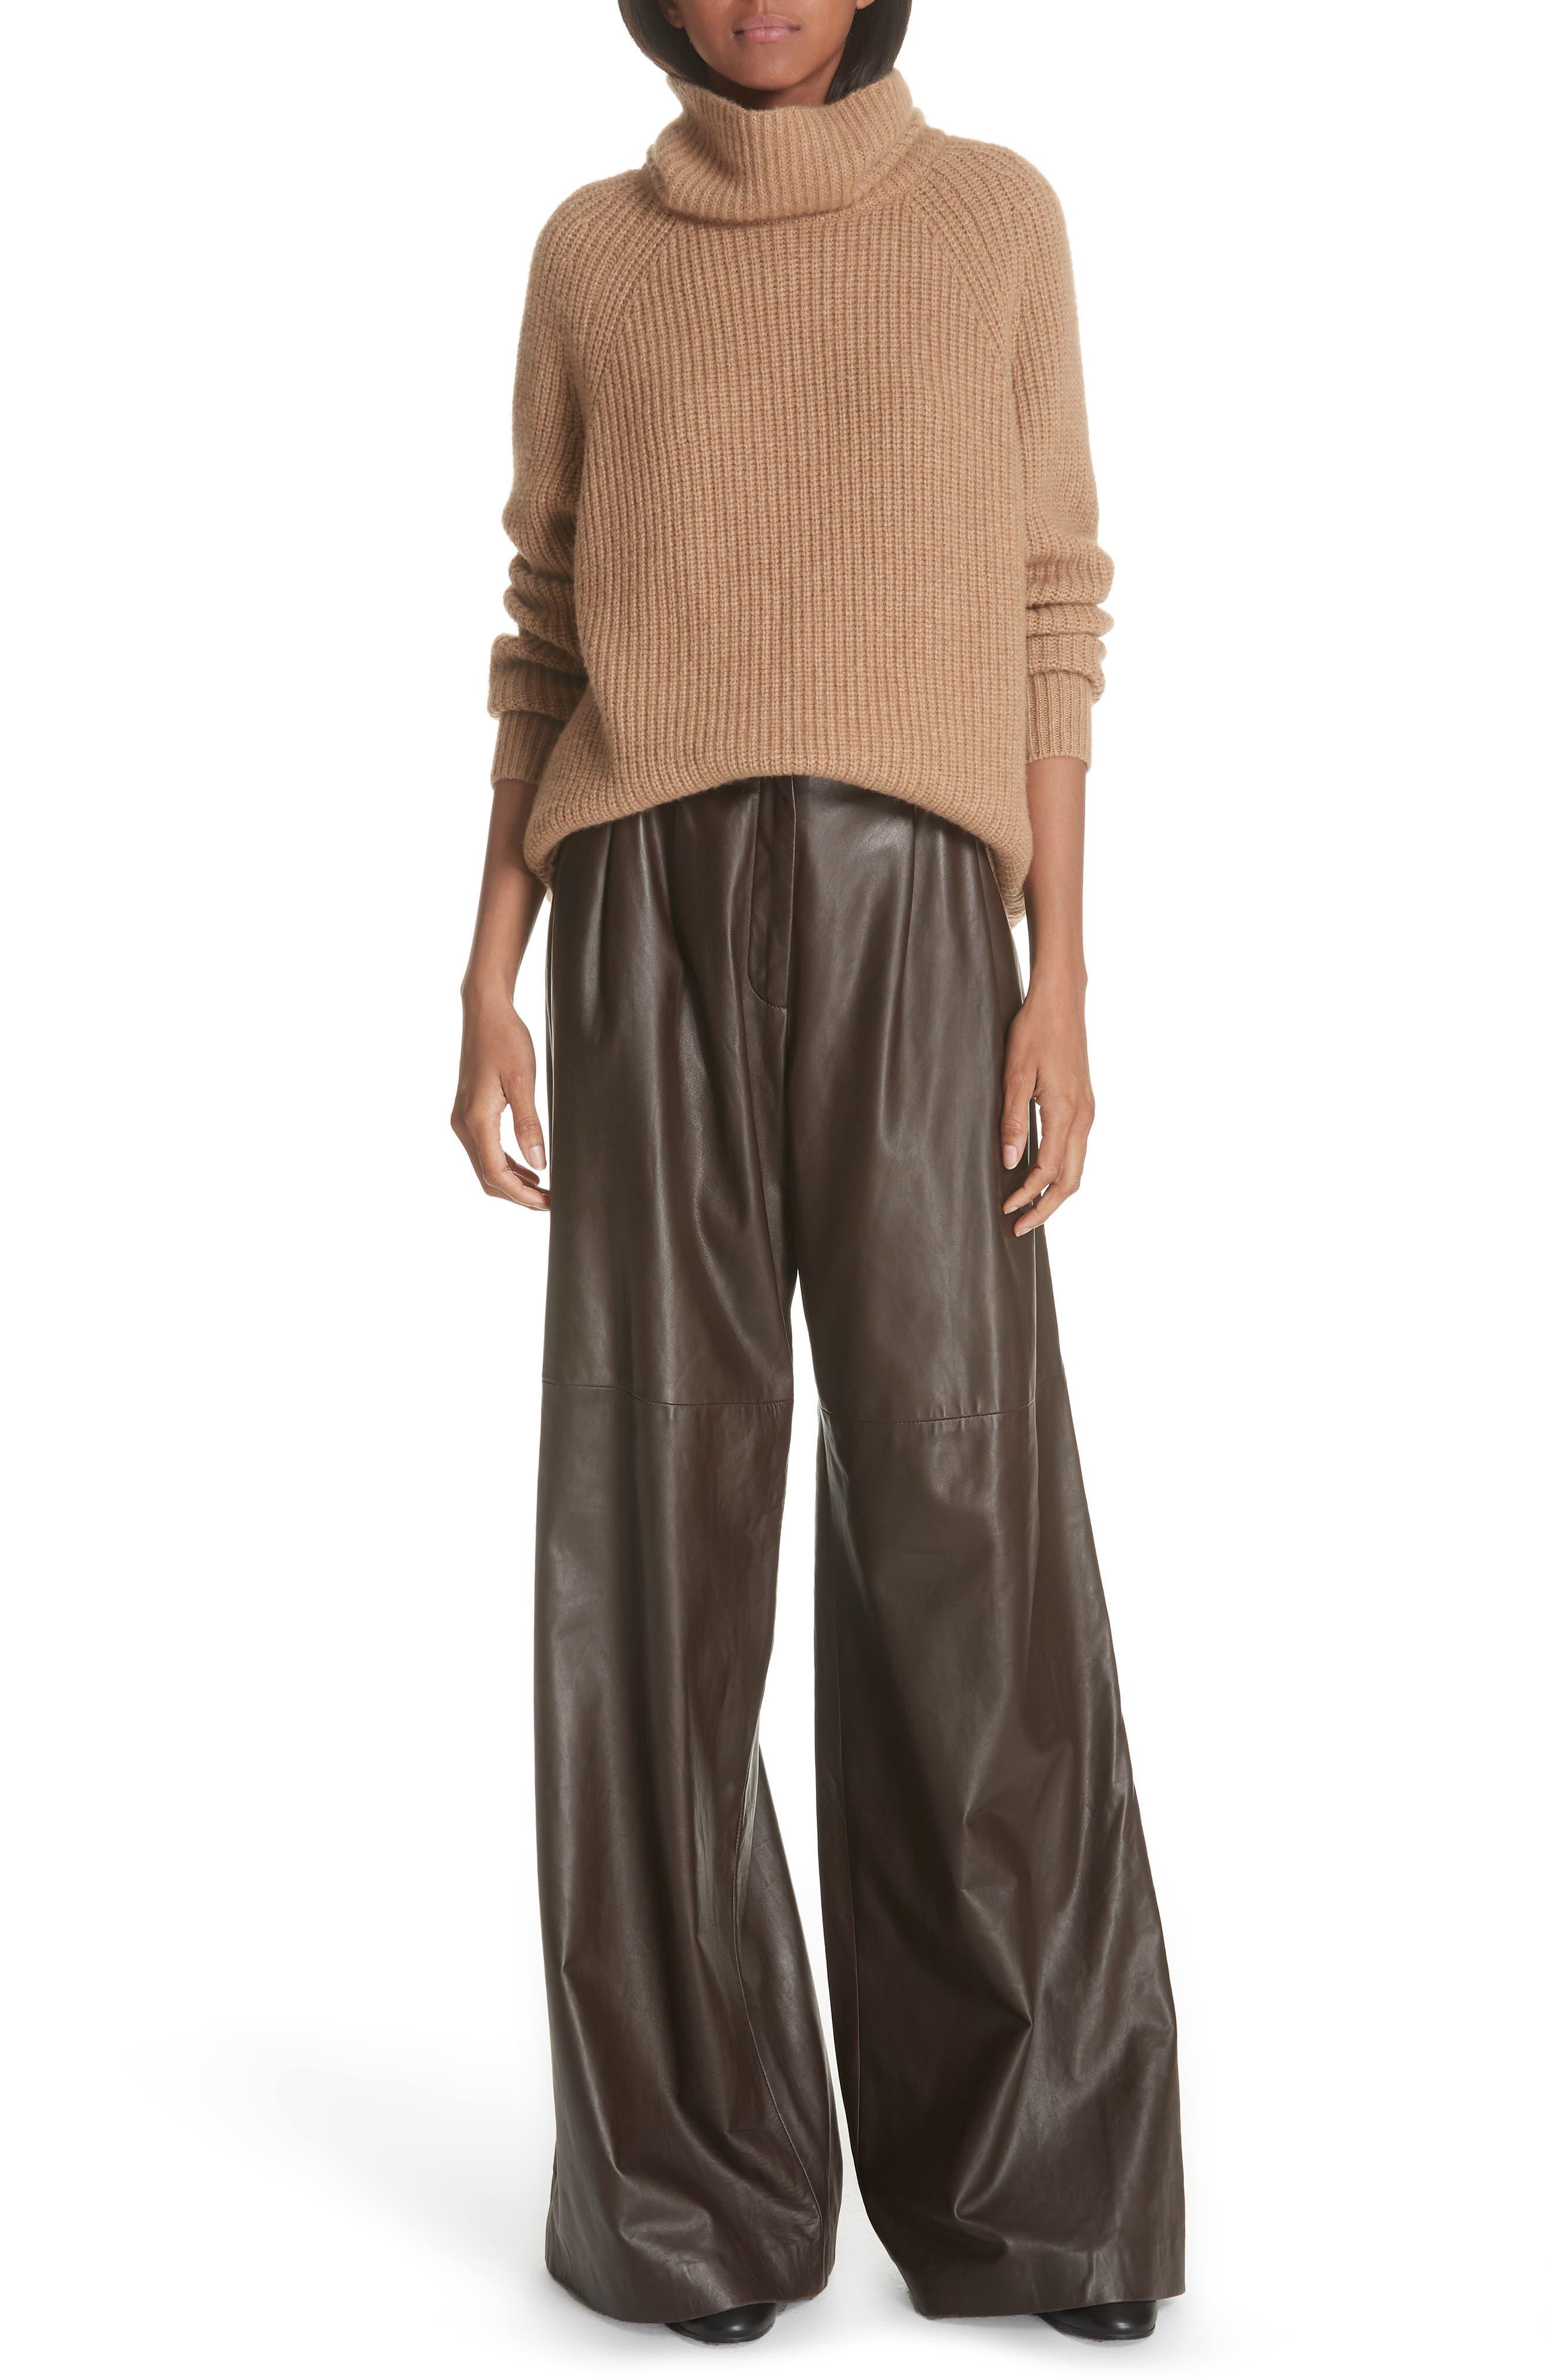 NILI LOTAN, Nico Leather Pants, Alternate thumbnail 6, color, BROWN